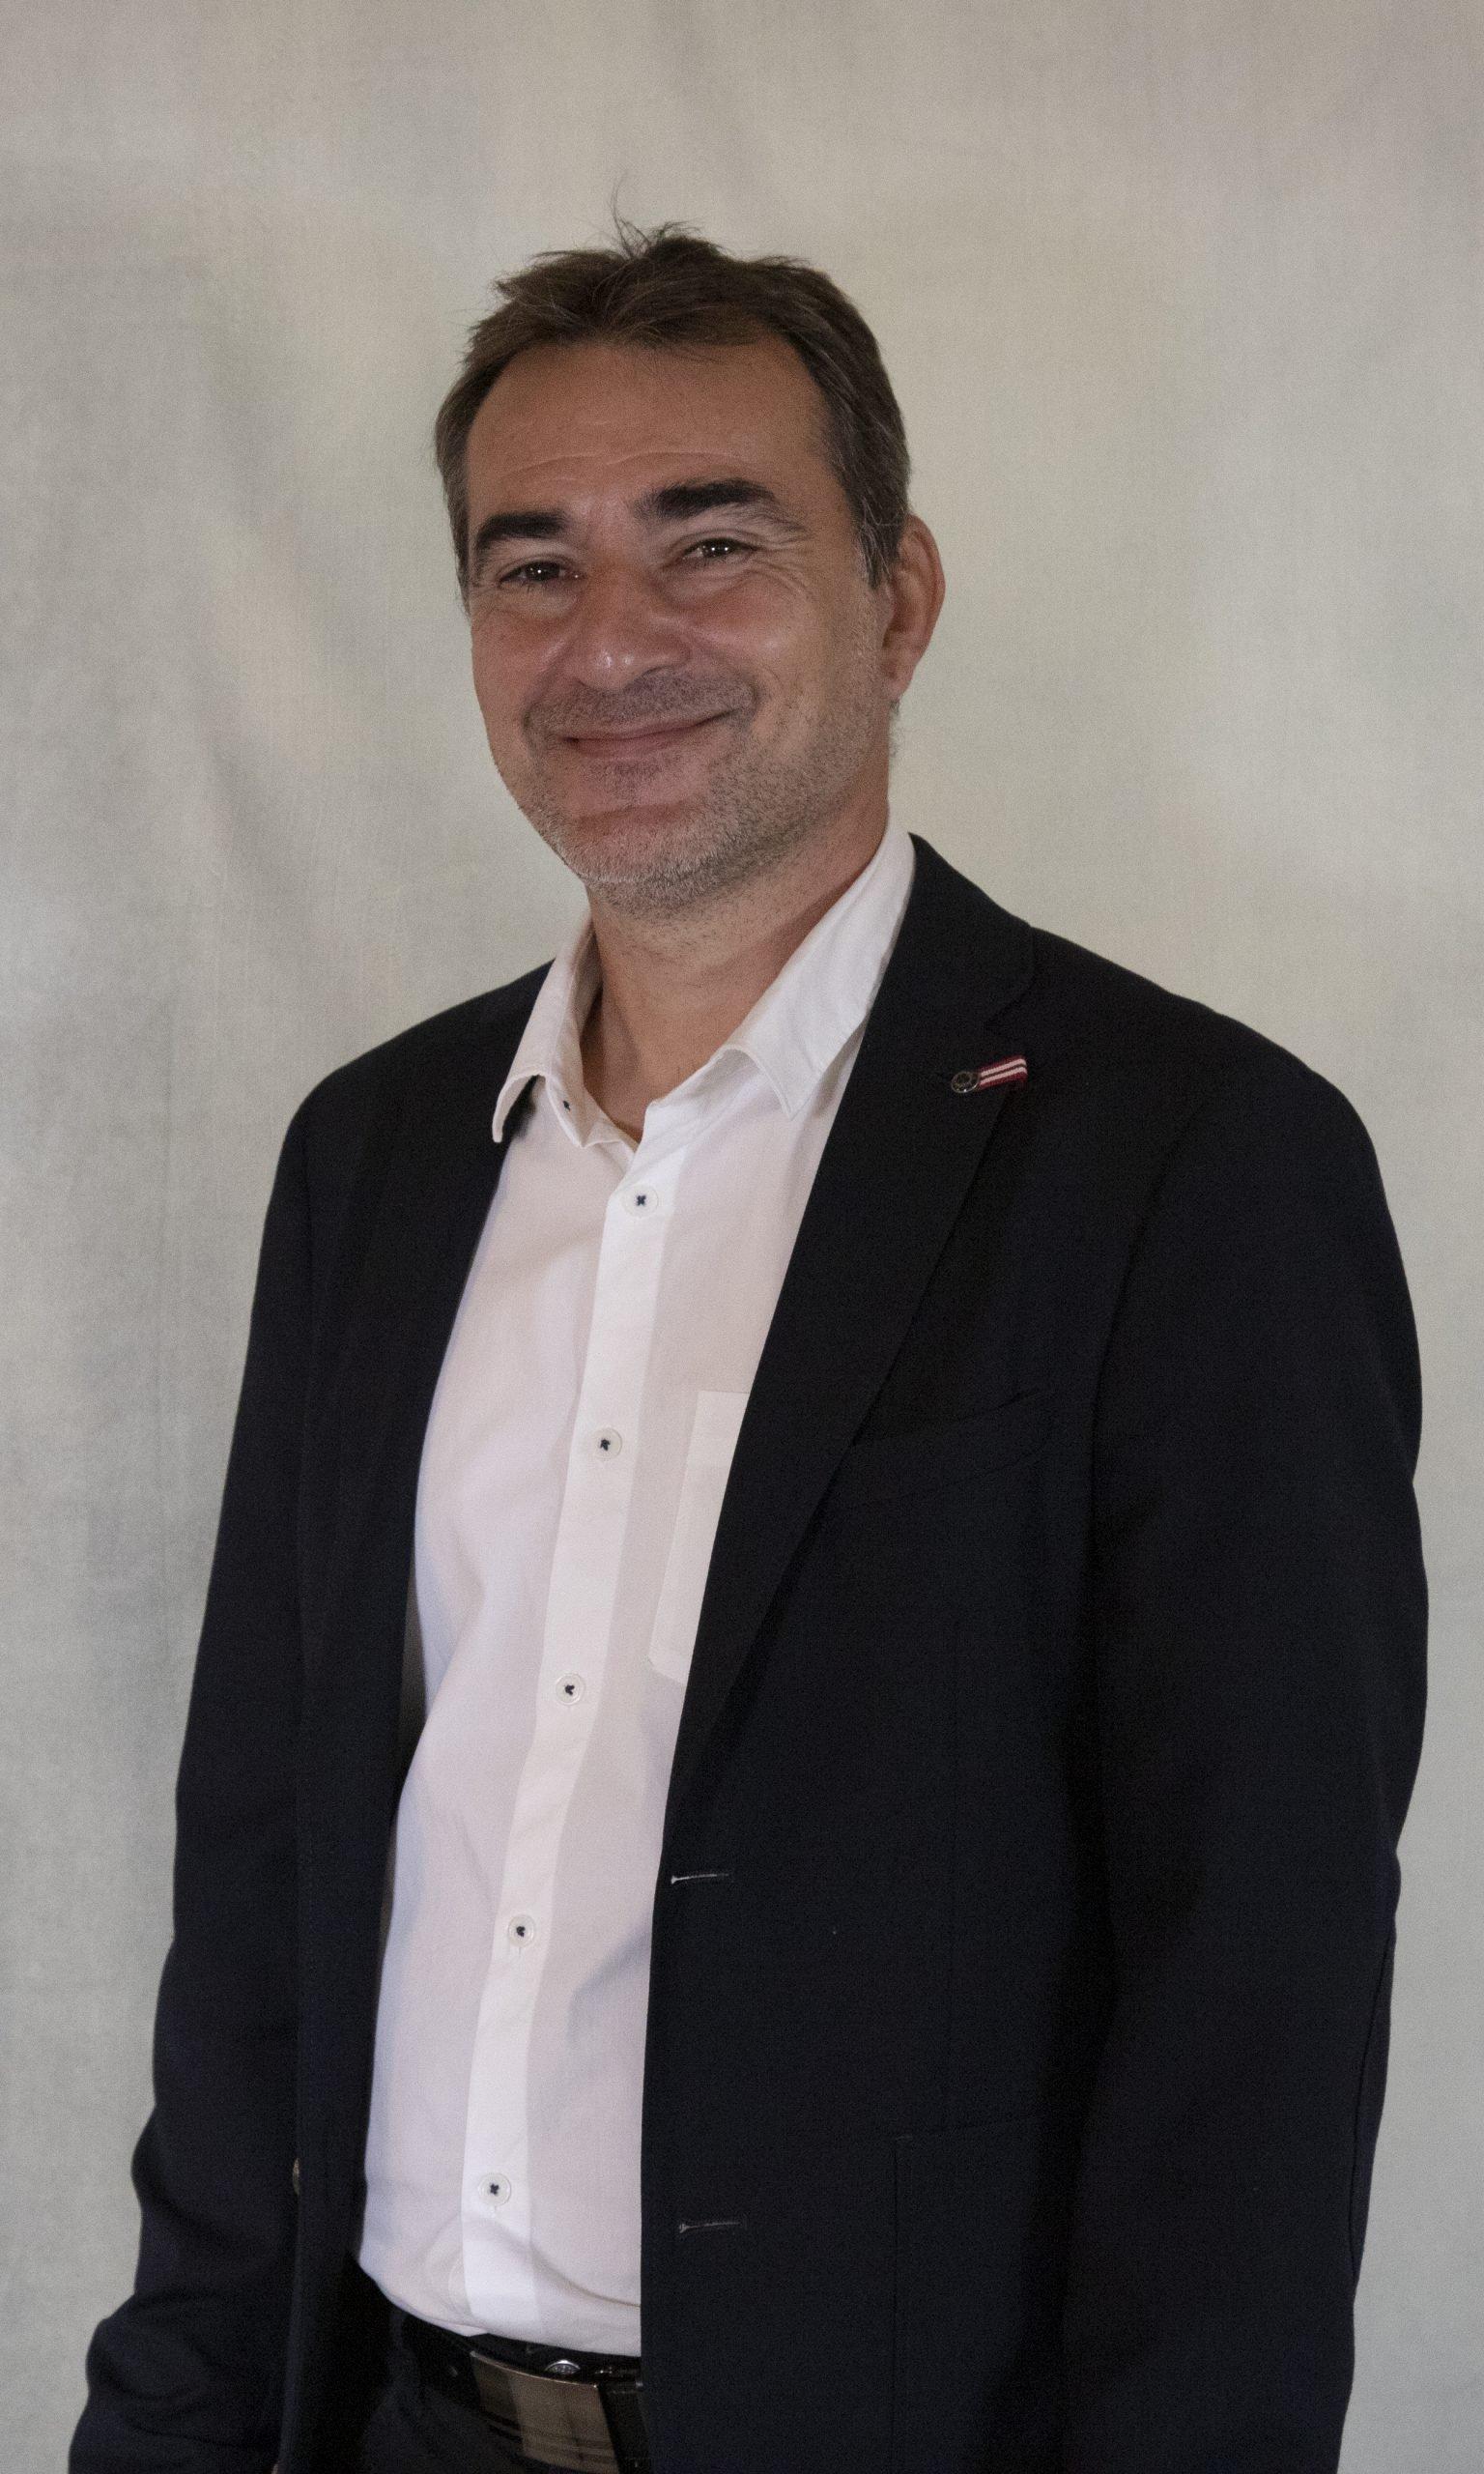 Fabien Leymarie